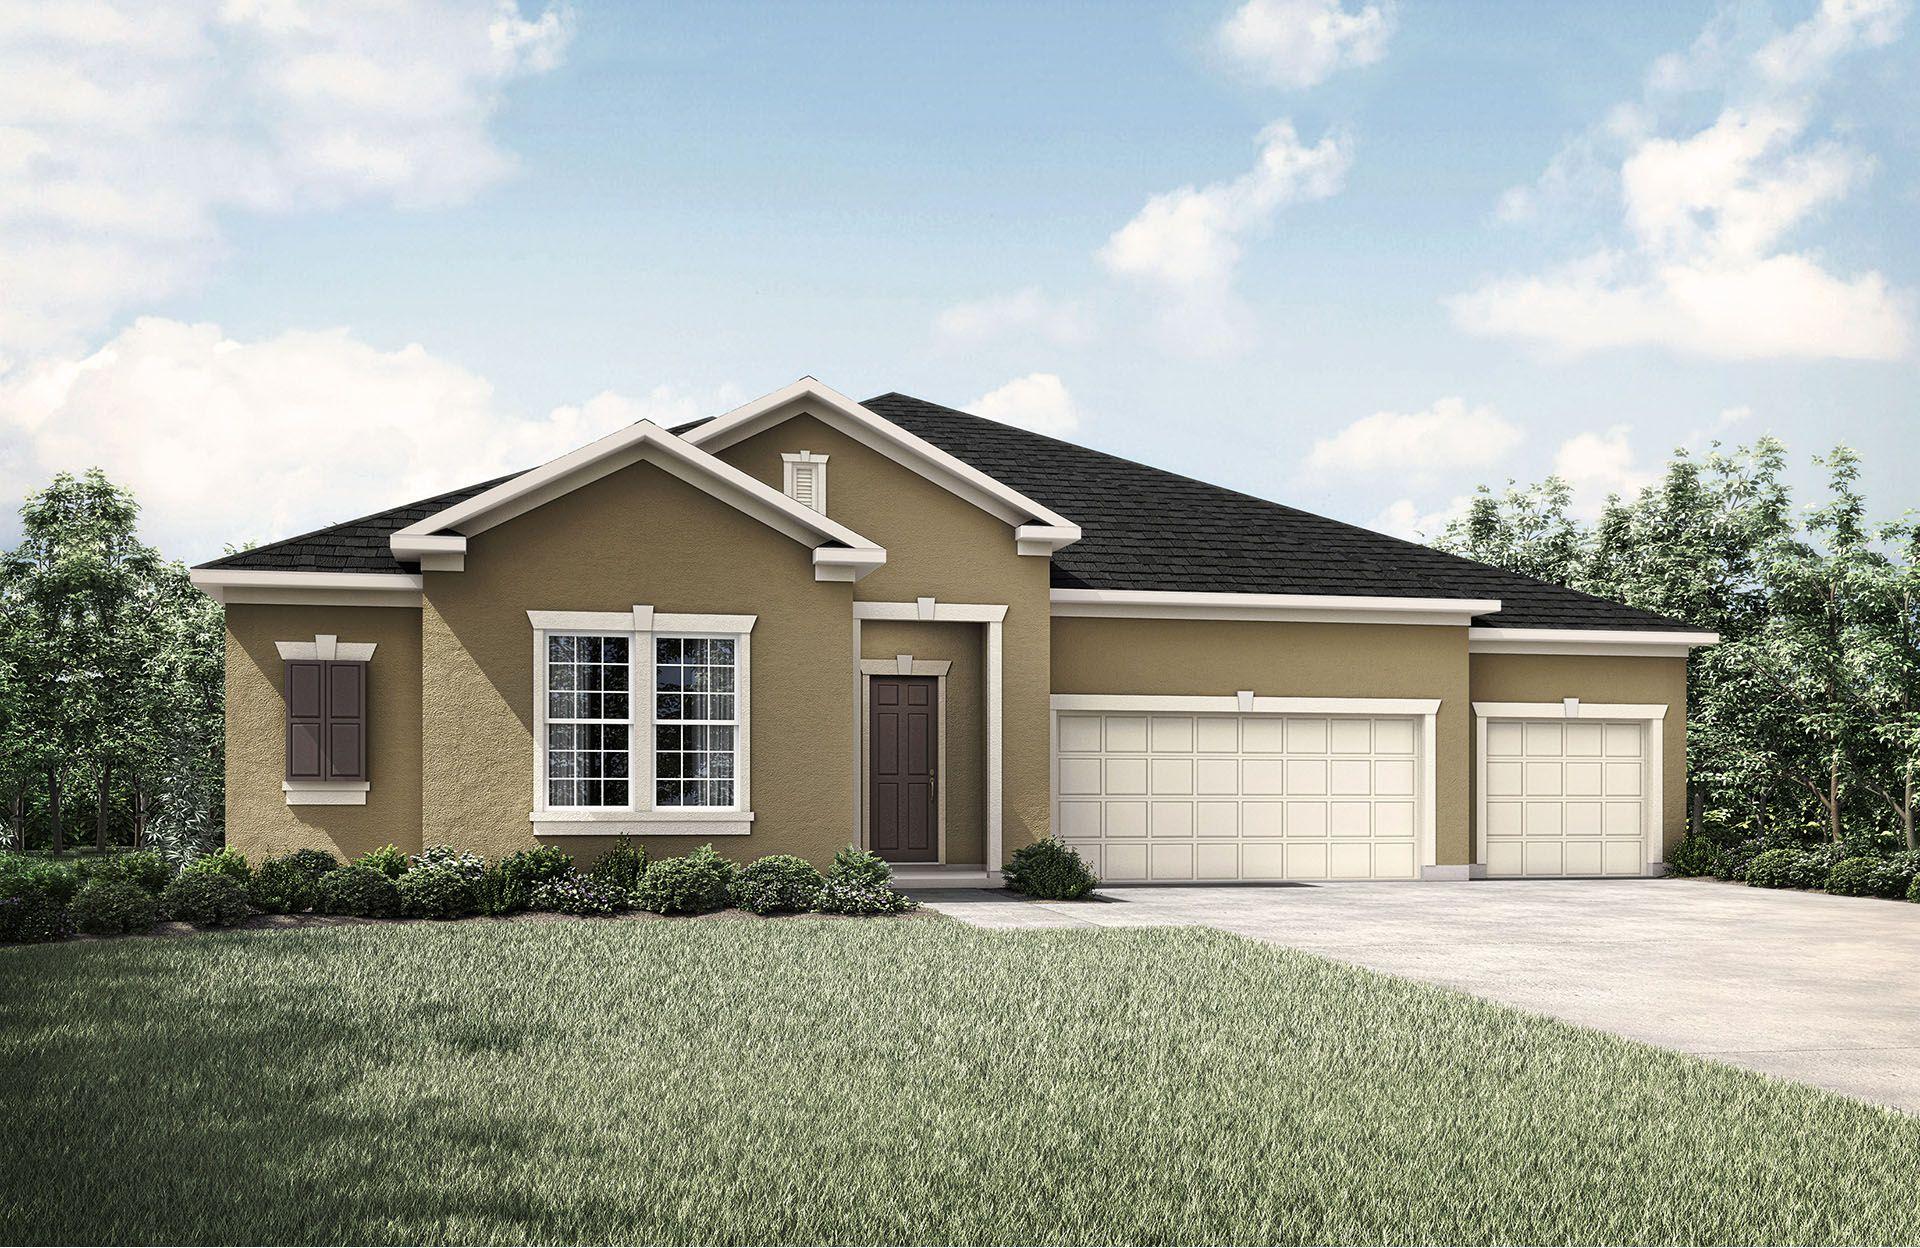 Single Family for Sale at Jacksonville Offsite - Teagan Jacksonville, Florida 32257 United States